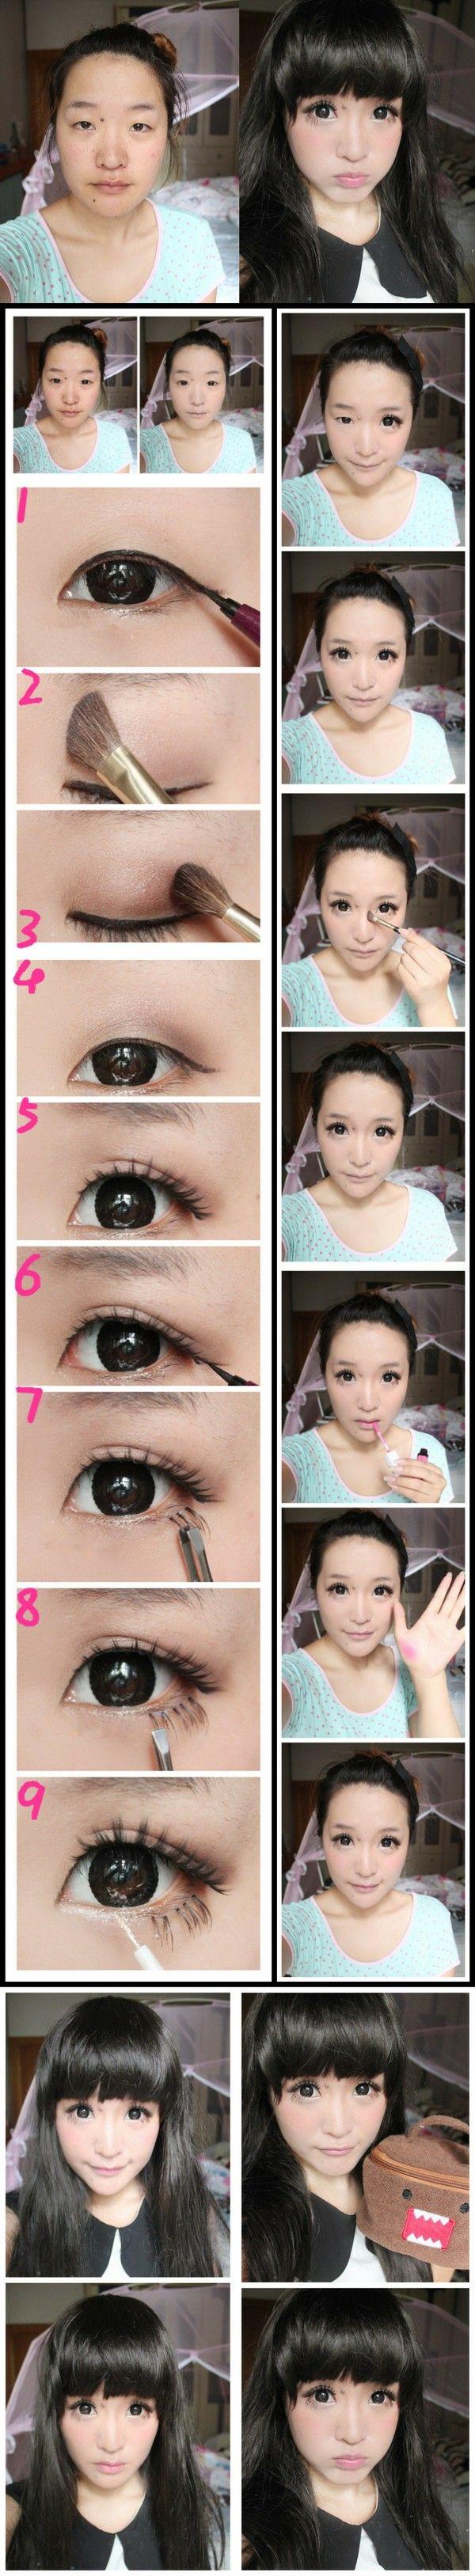 Monolid ulzzang makeup transformation by  灵鸾妮妮 Lingluan Nini